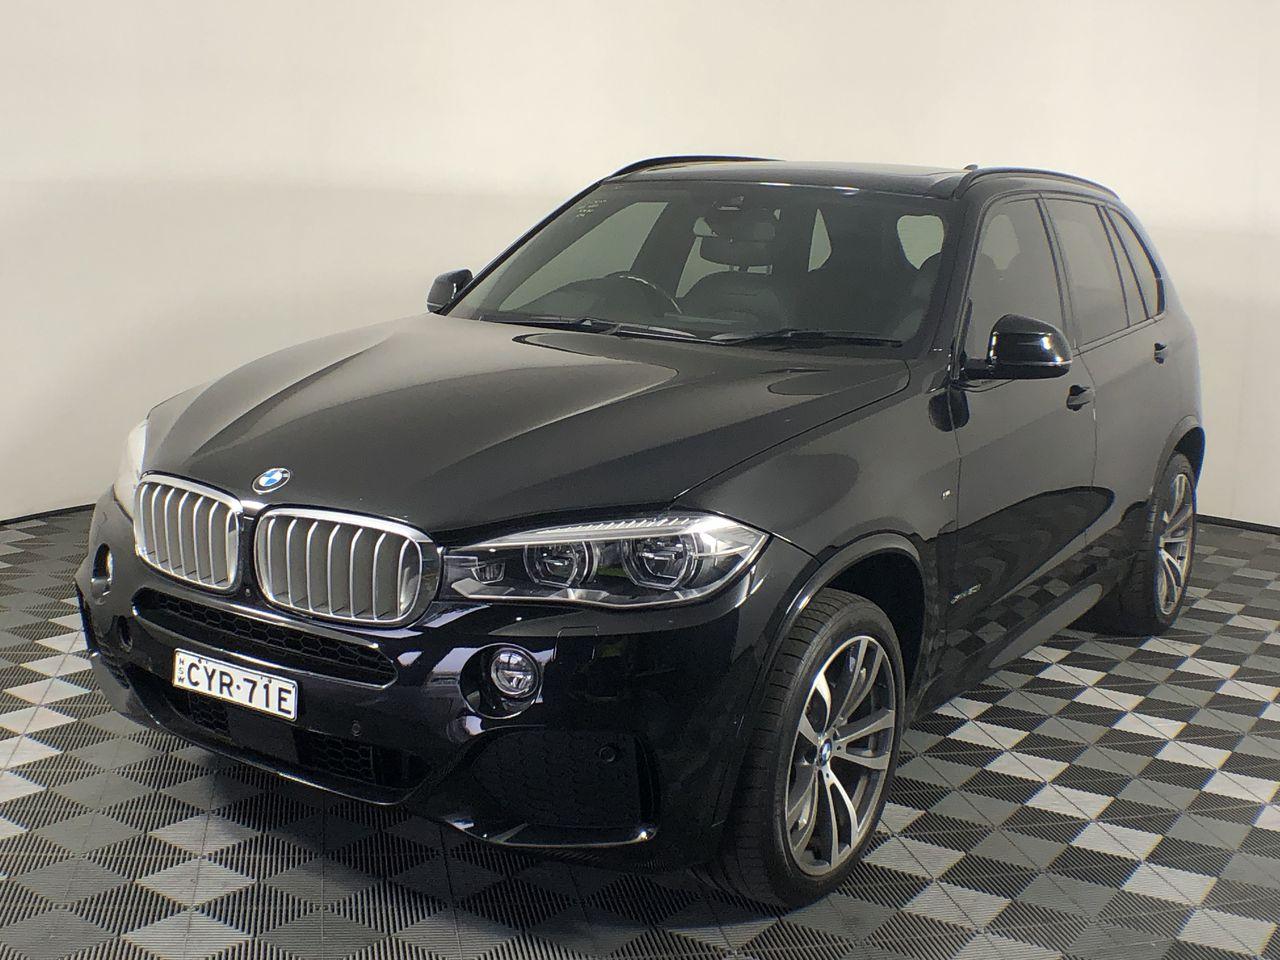 2015 BMW X5 xDrive 50i M-Sport F15 Automatic 7 Seat Wagon 48,176km